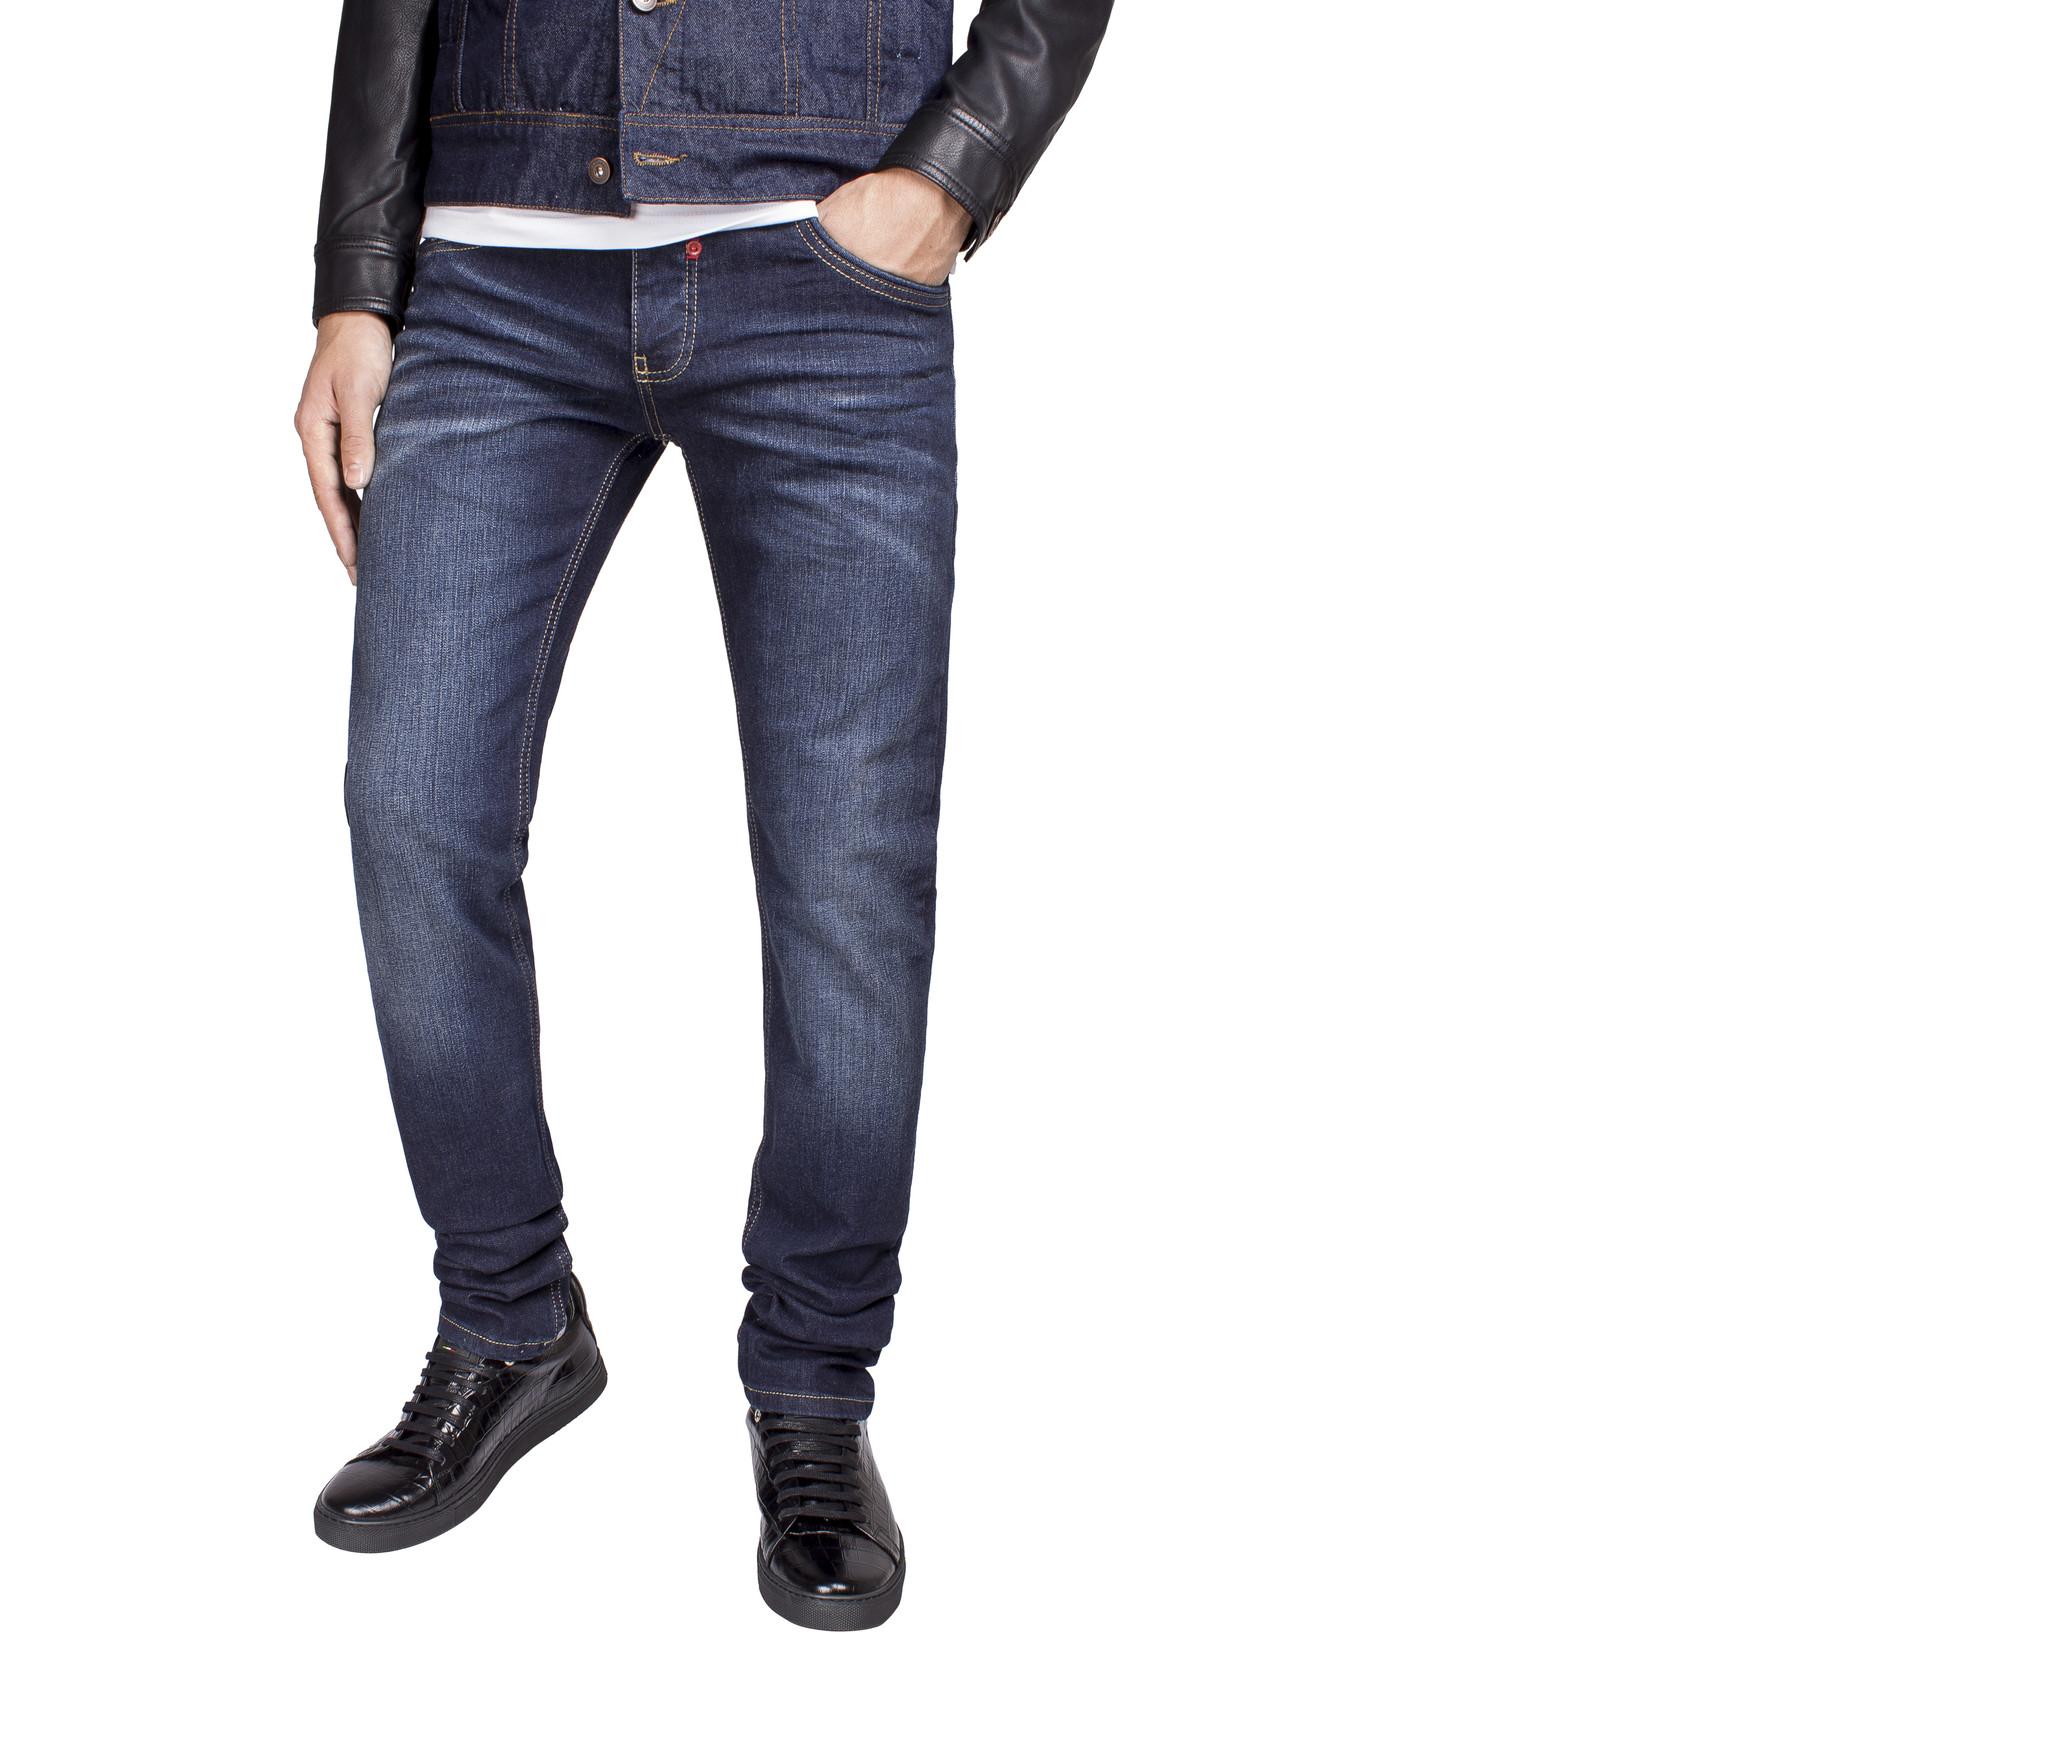 Arya Boy Jeans 82069 Dark Navy L34 Maat: 36/34